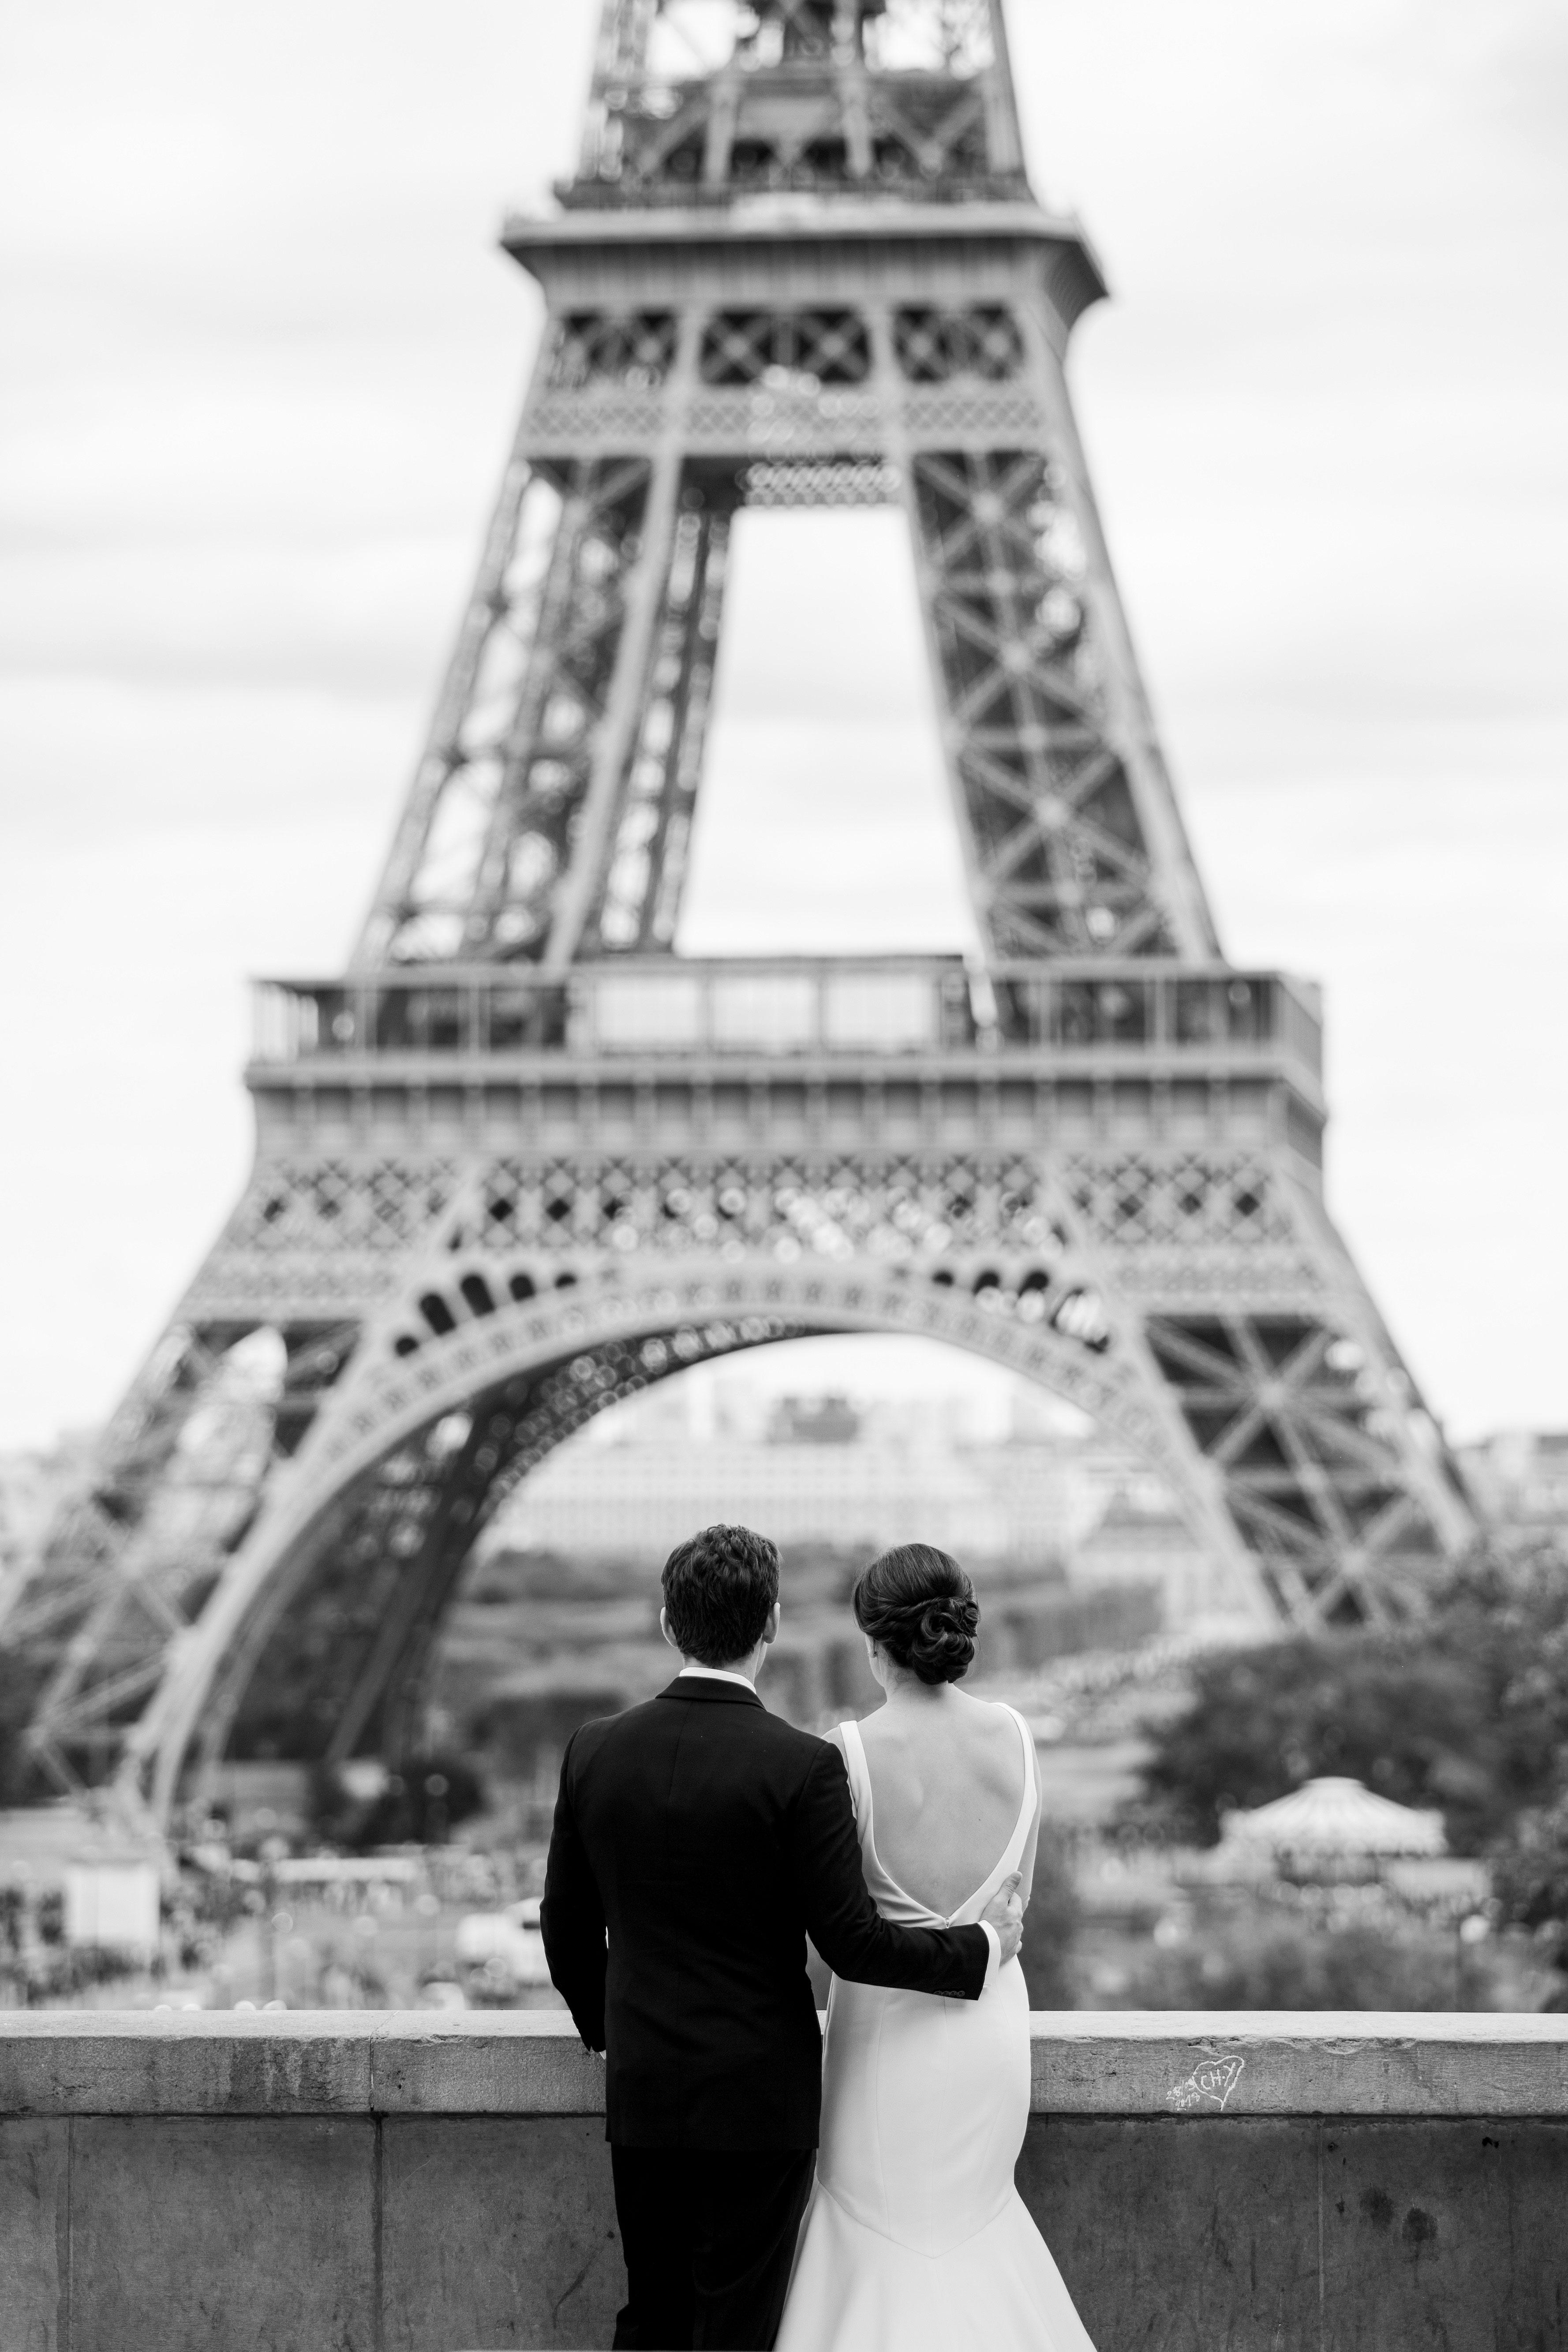 wedding couple eiffel tower